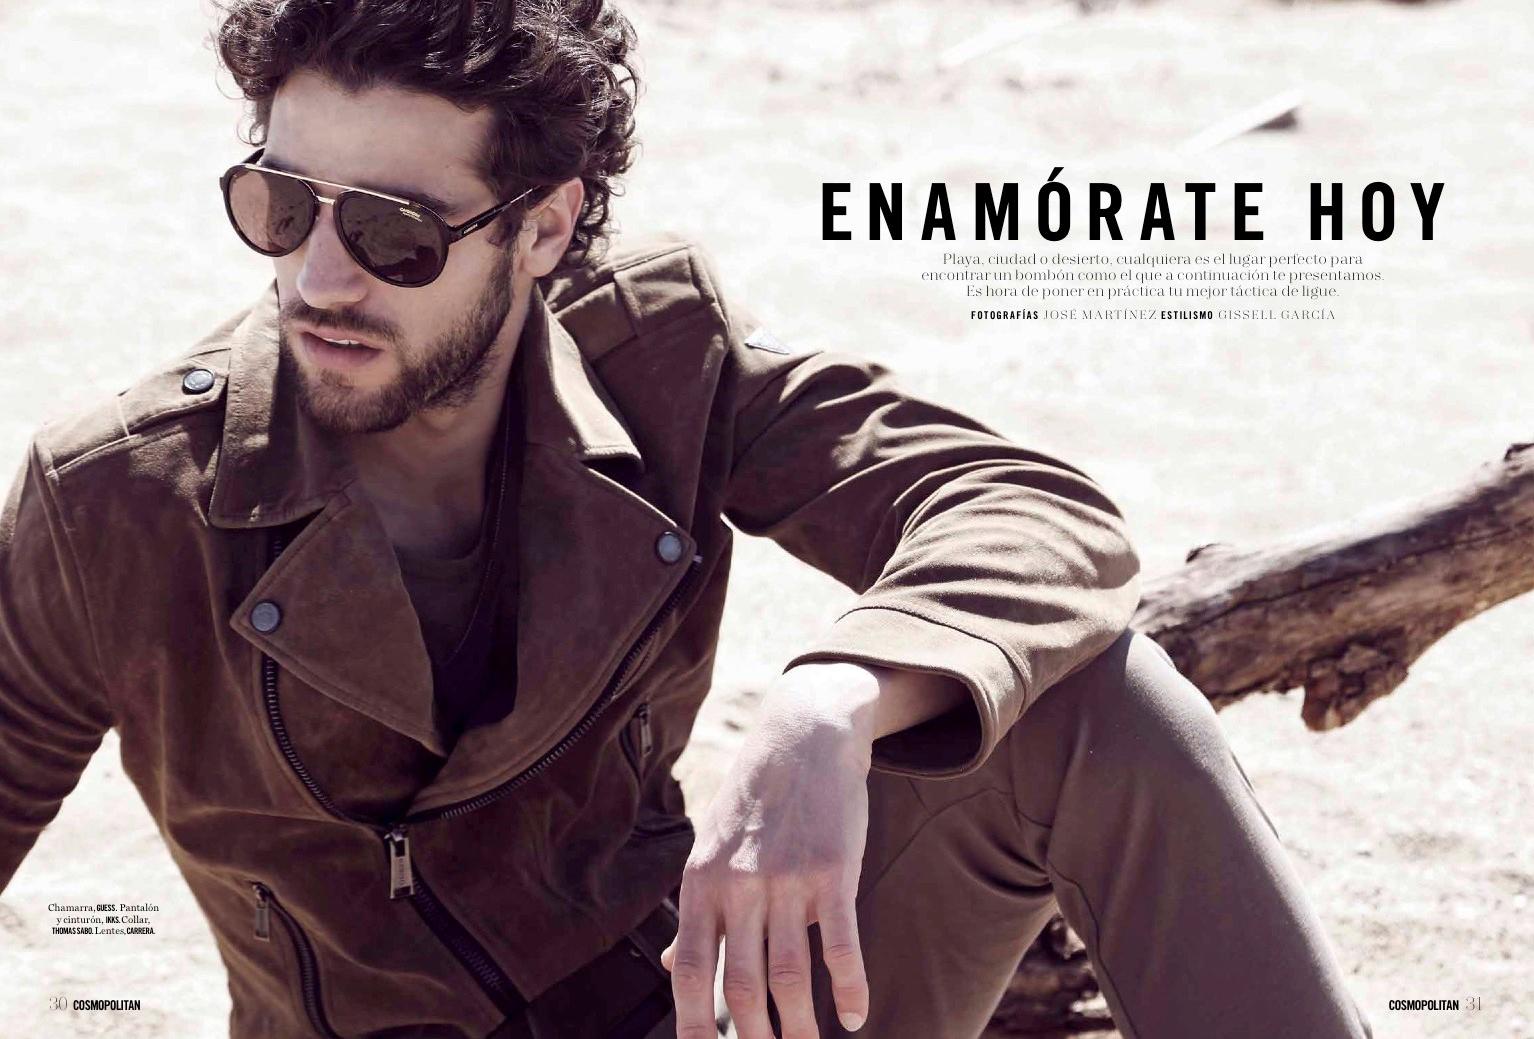 Enamorate Hoy - Jose Martinez - Gissell Garcia - CosmoMen Sept17 1